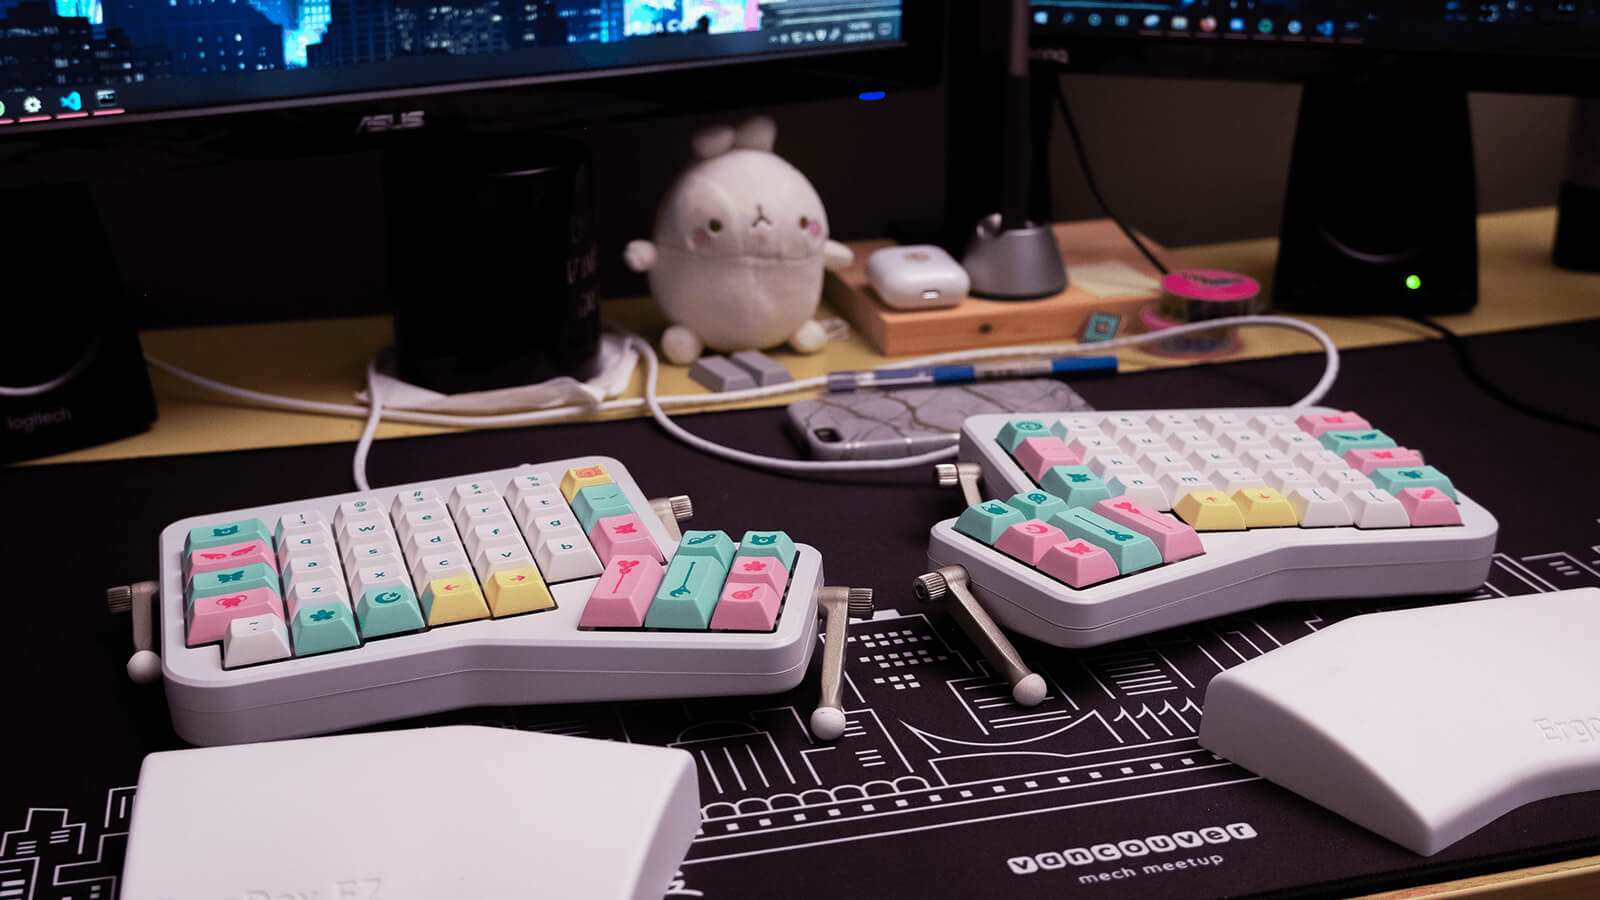 My keyboard on my desk.